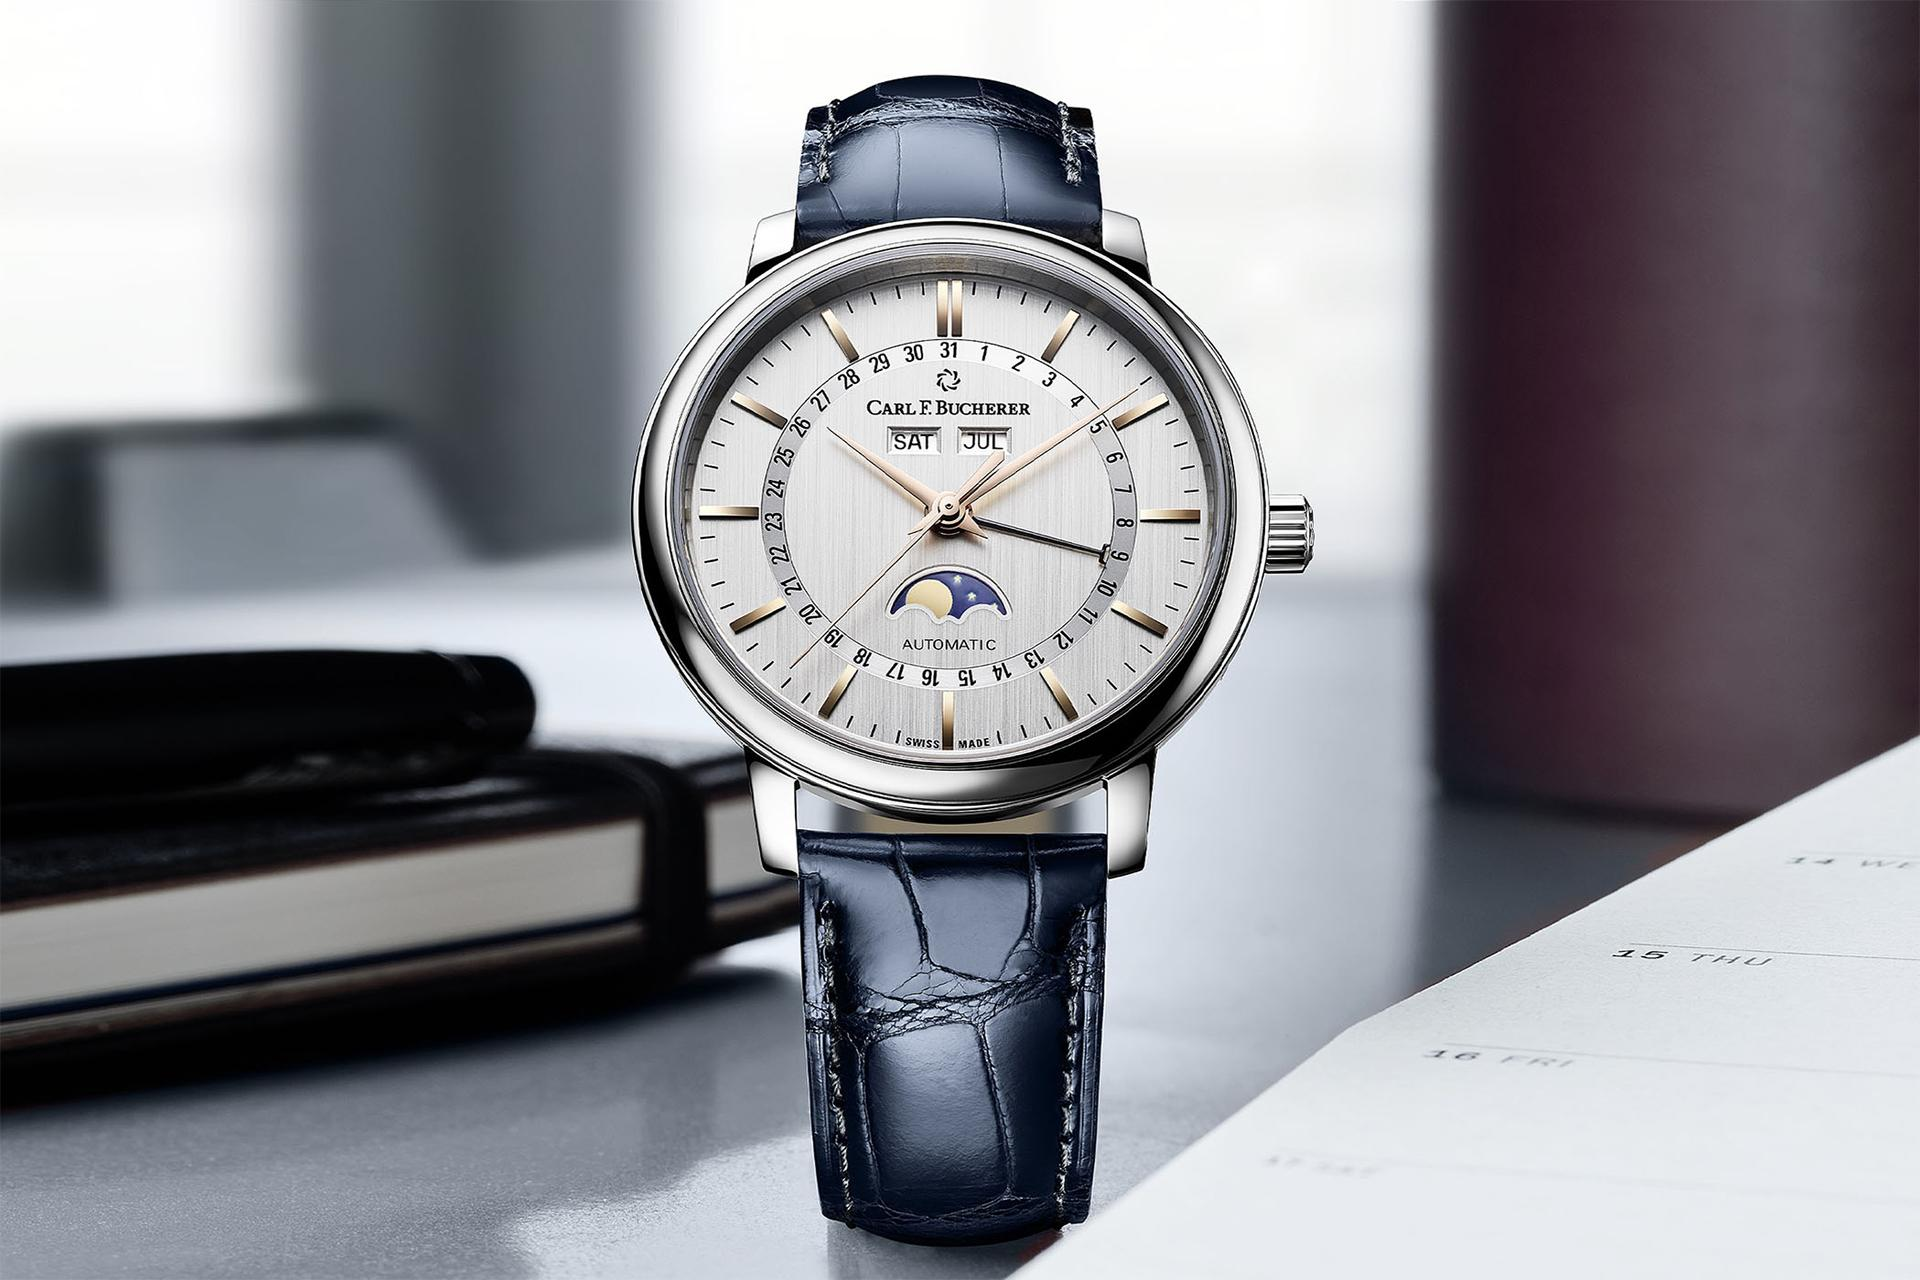 Carl F Bucherer Adamavi Full Calendar watch